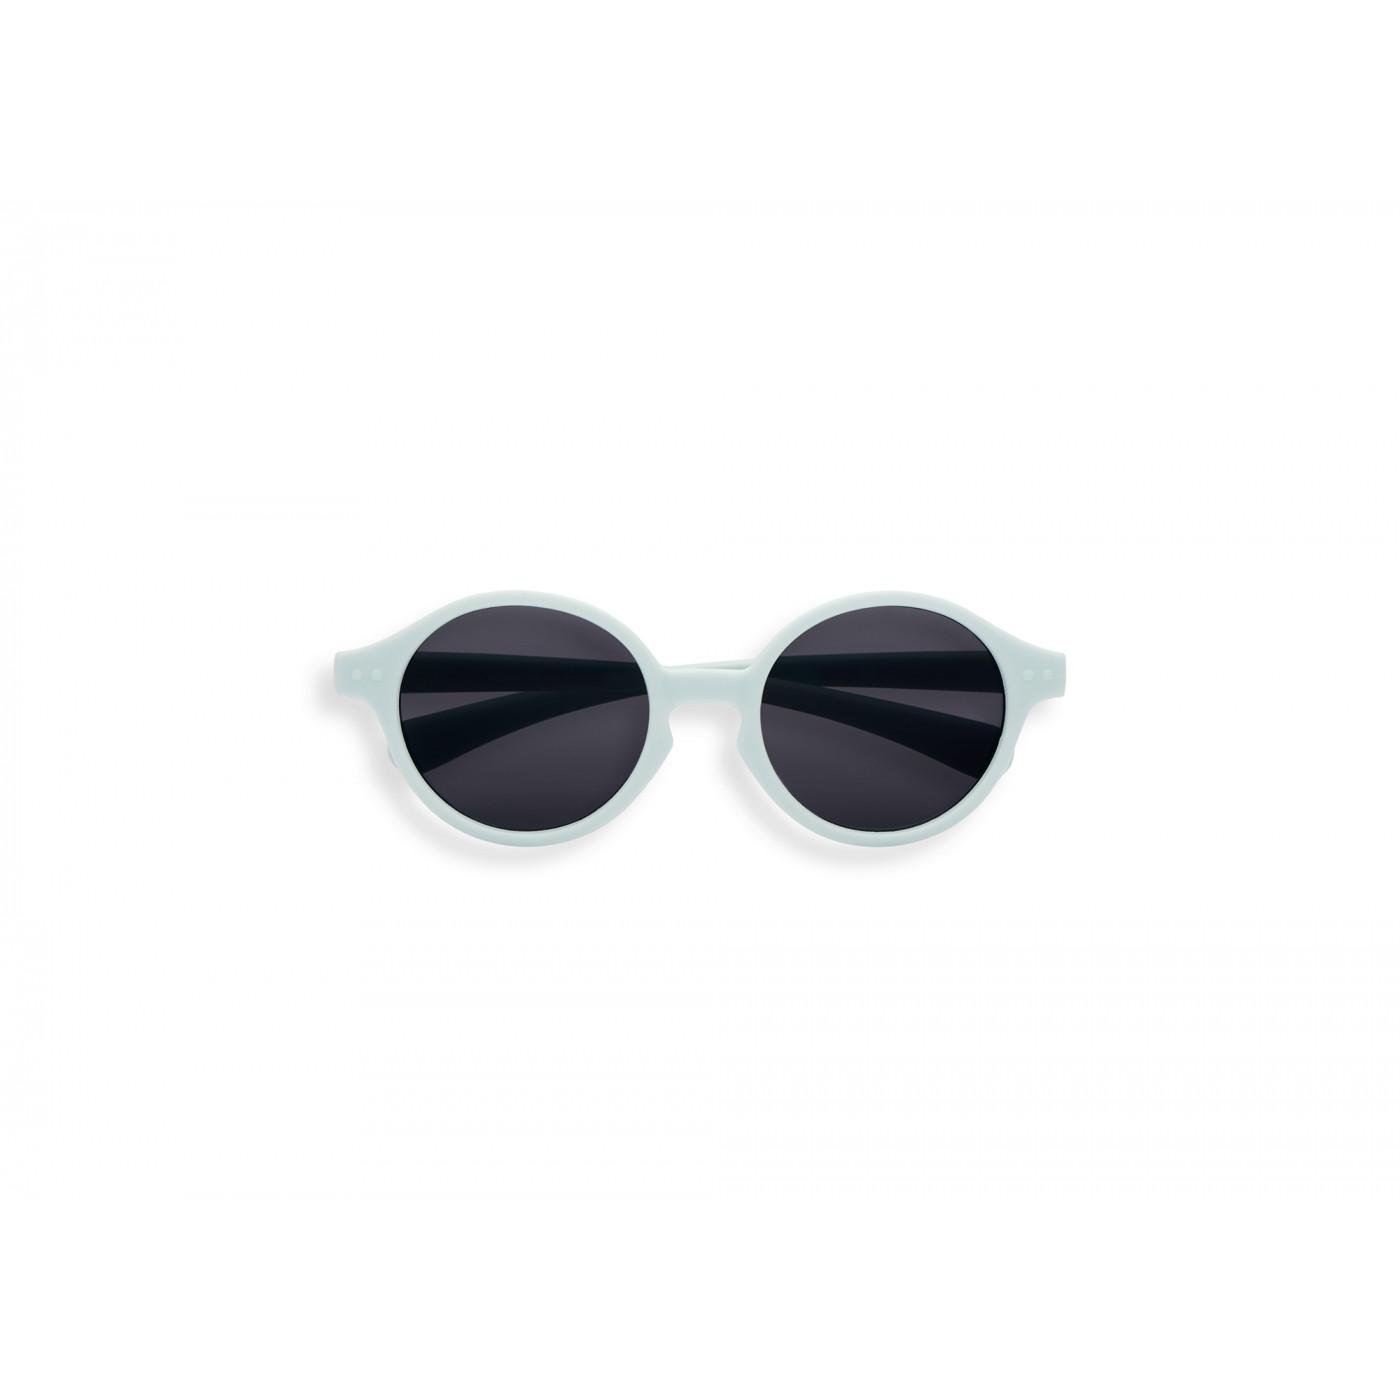 IZIPIZI brille #SUN KIDS Sweet Blue